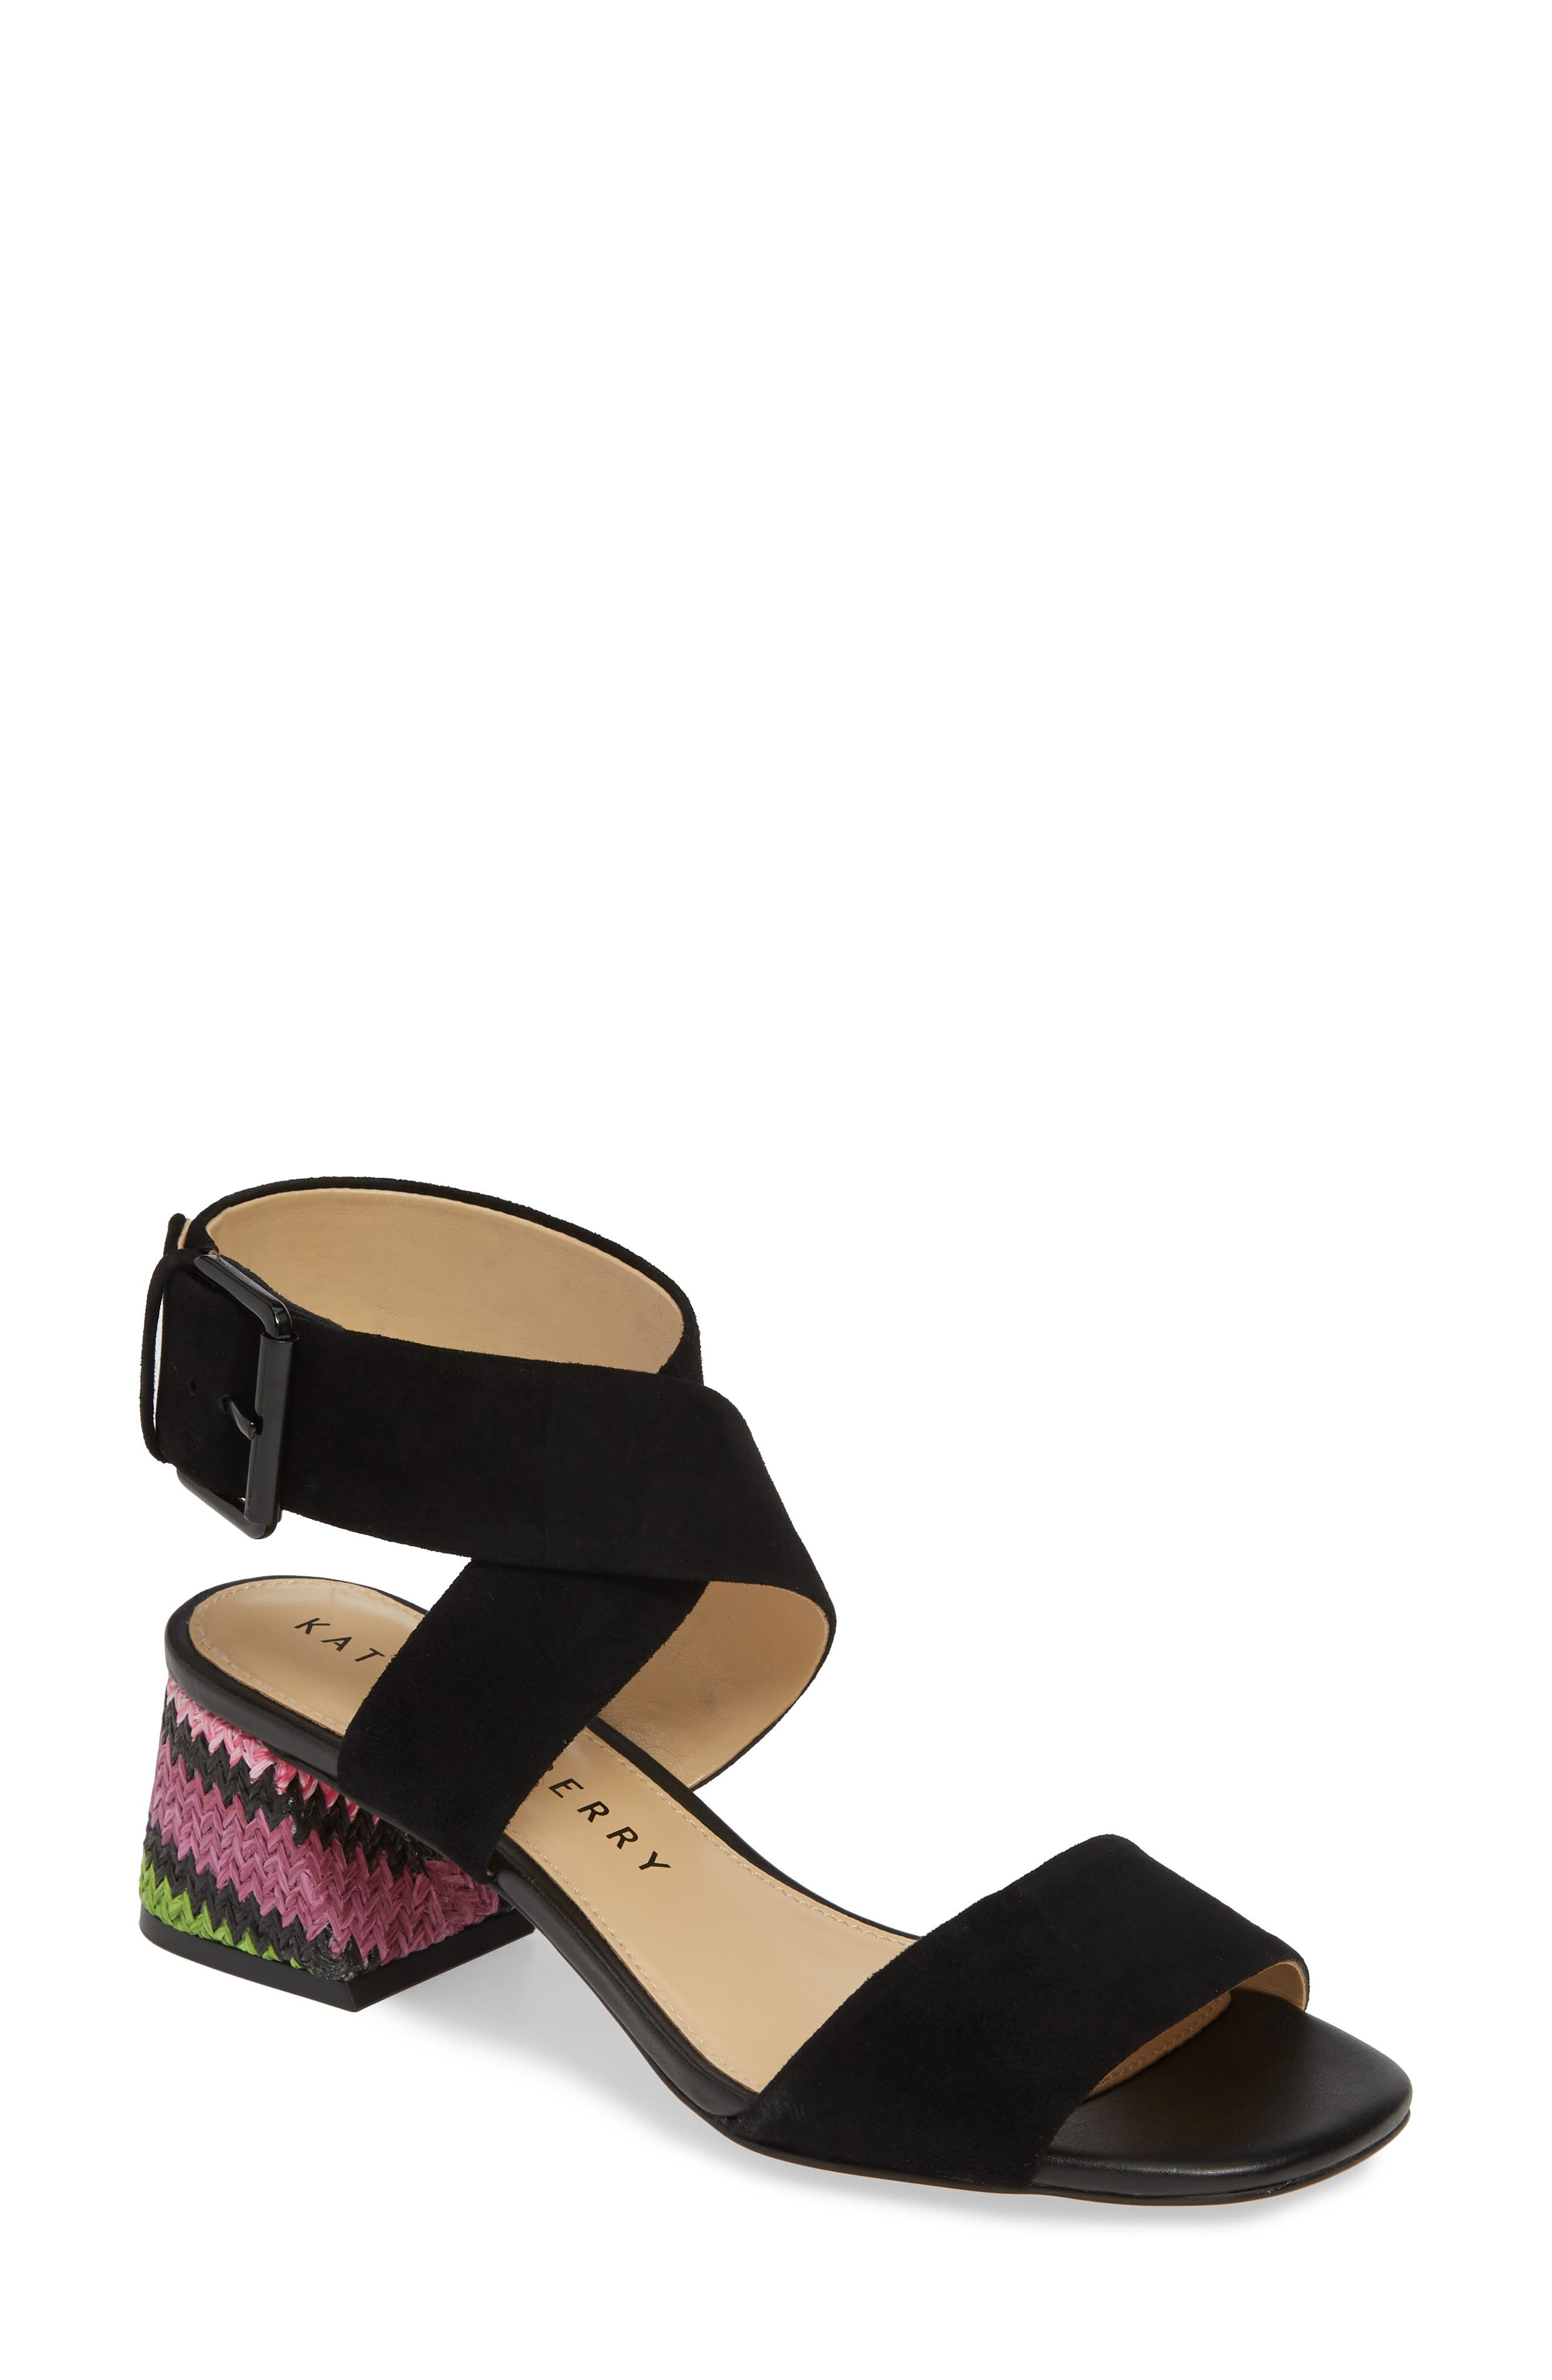 women's katy perry albee sandal, size 6.5 m - black